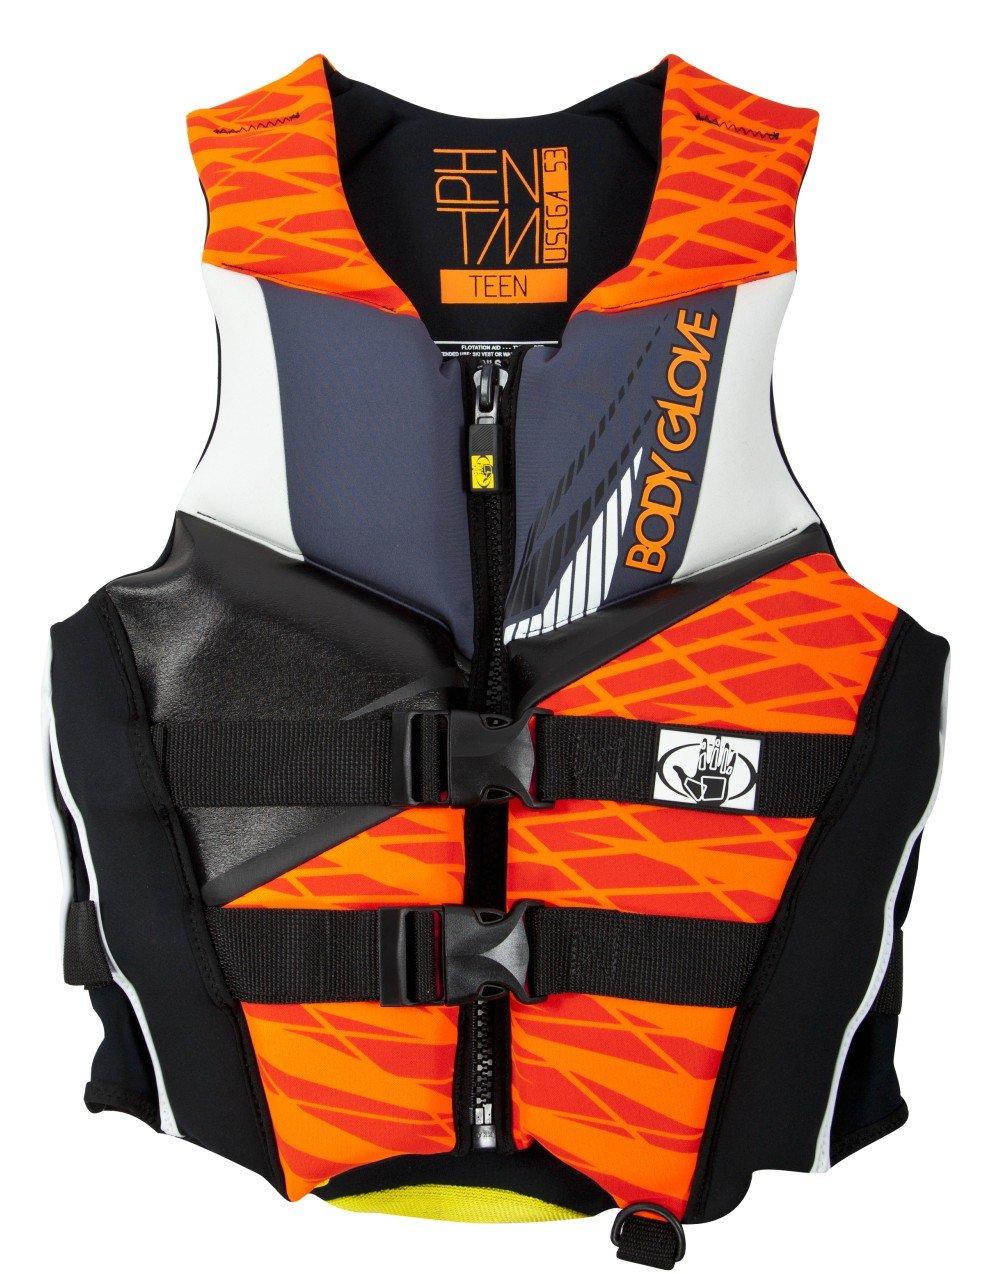 Body Glove Wetsuit Co Men's Phantom Neoprene US Coast Guard Approved PFD Life Jacket, Orange/Black, Medium by Body Glove Wetsuit Co B01H2P4CPO